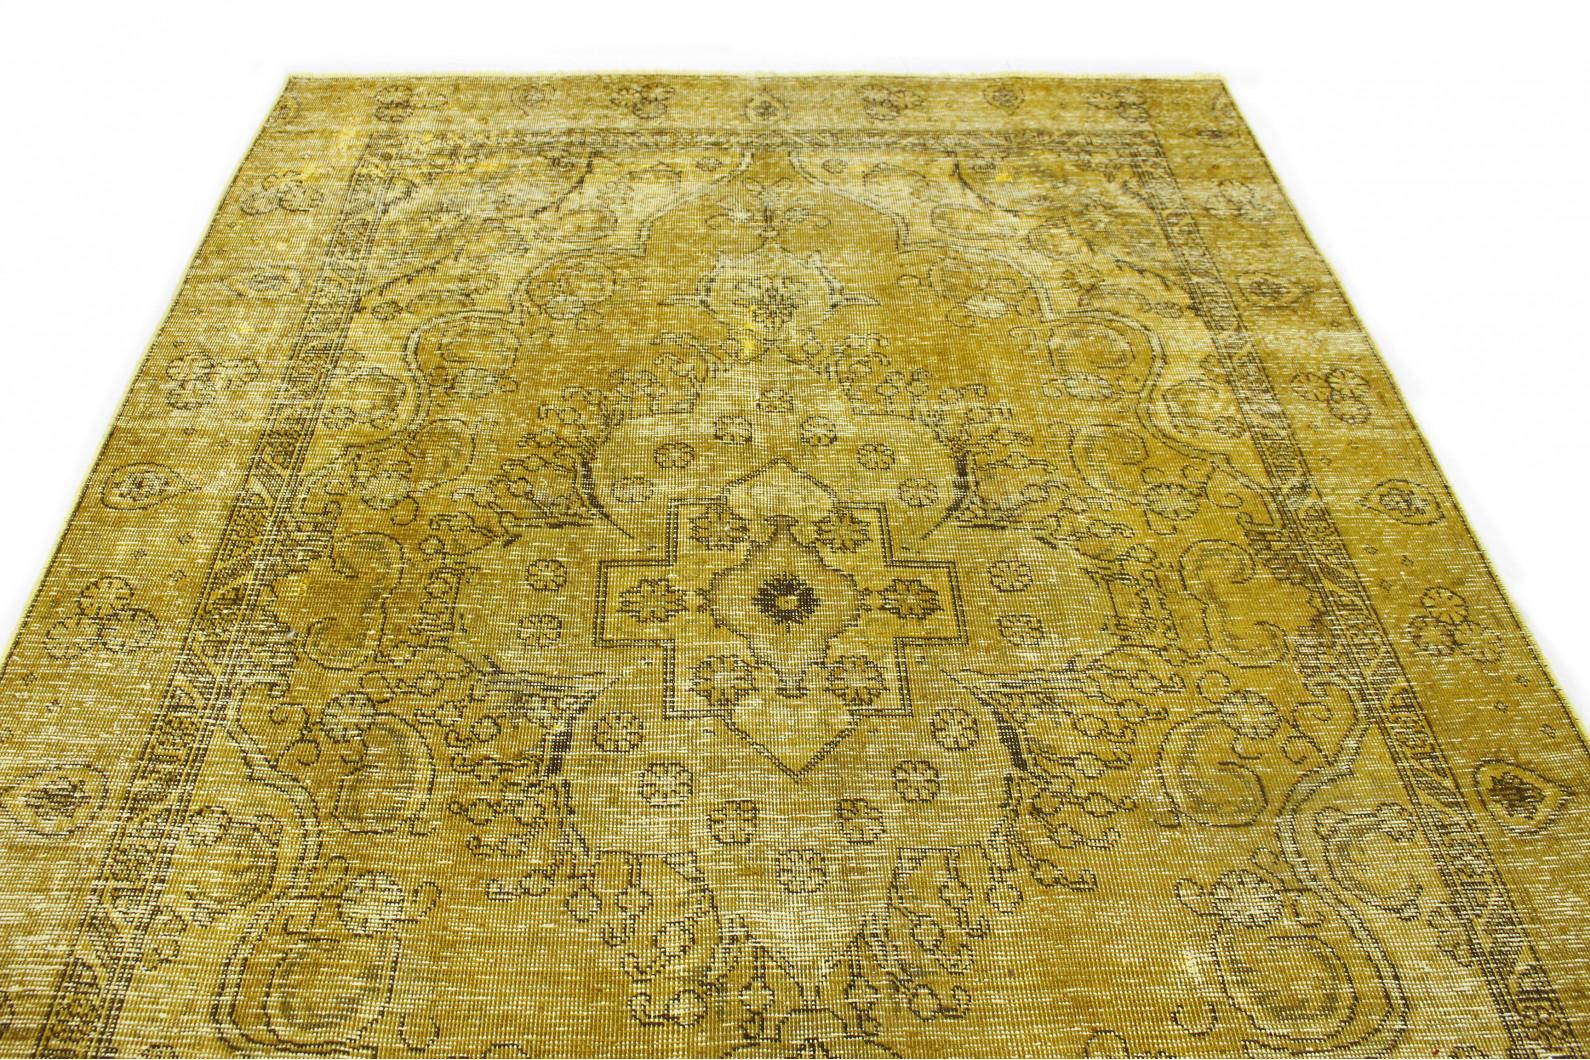 vintage teppich gelb gold in 300x200 1001 167184 bei. Black Bedroom Furniture Sets. Home Design Ideas